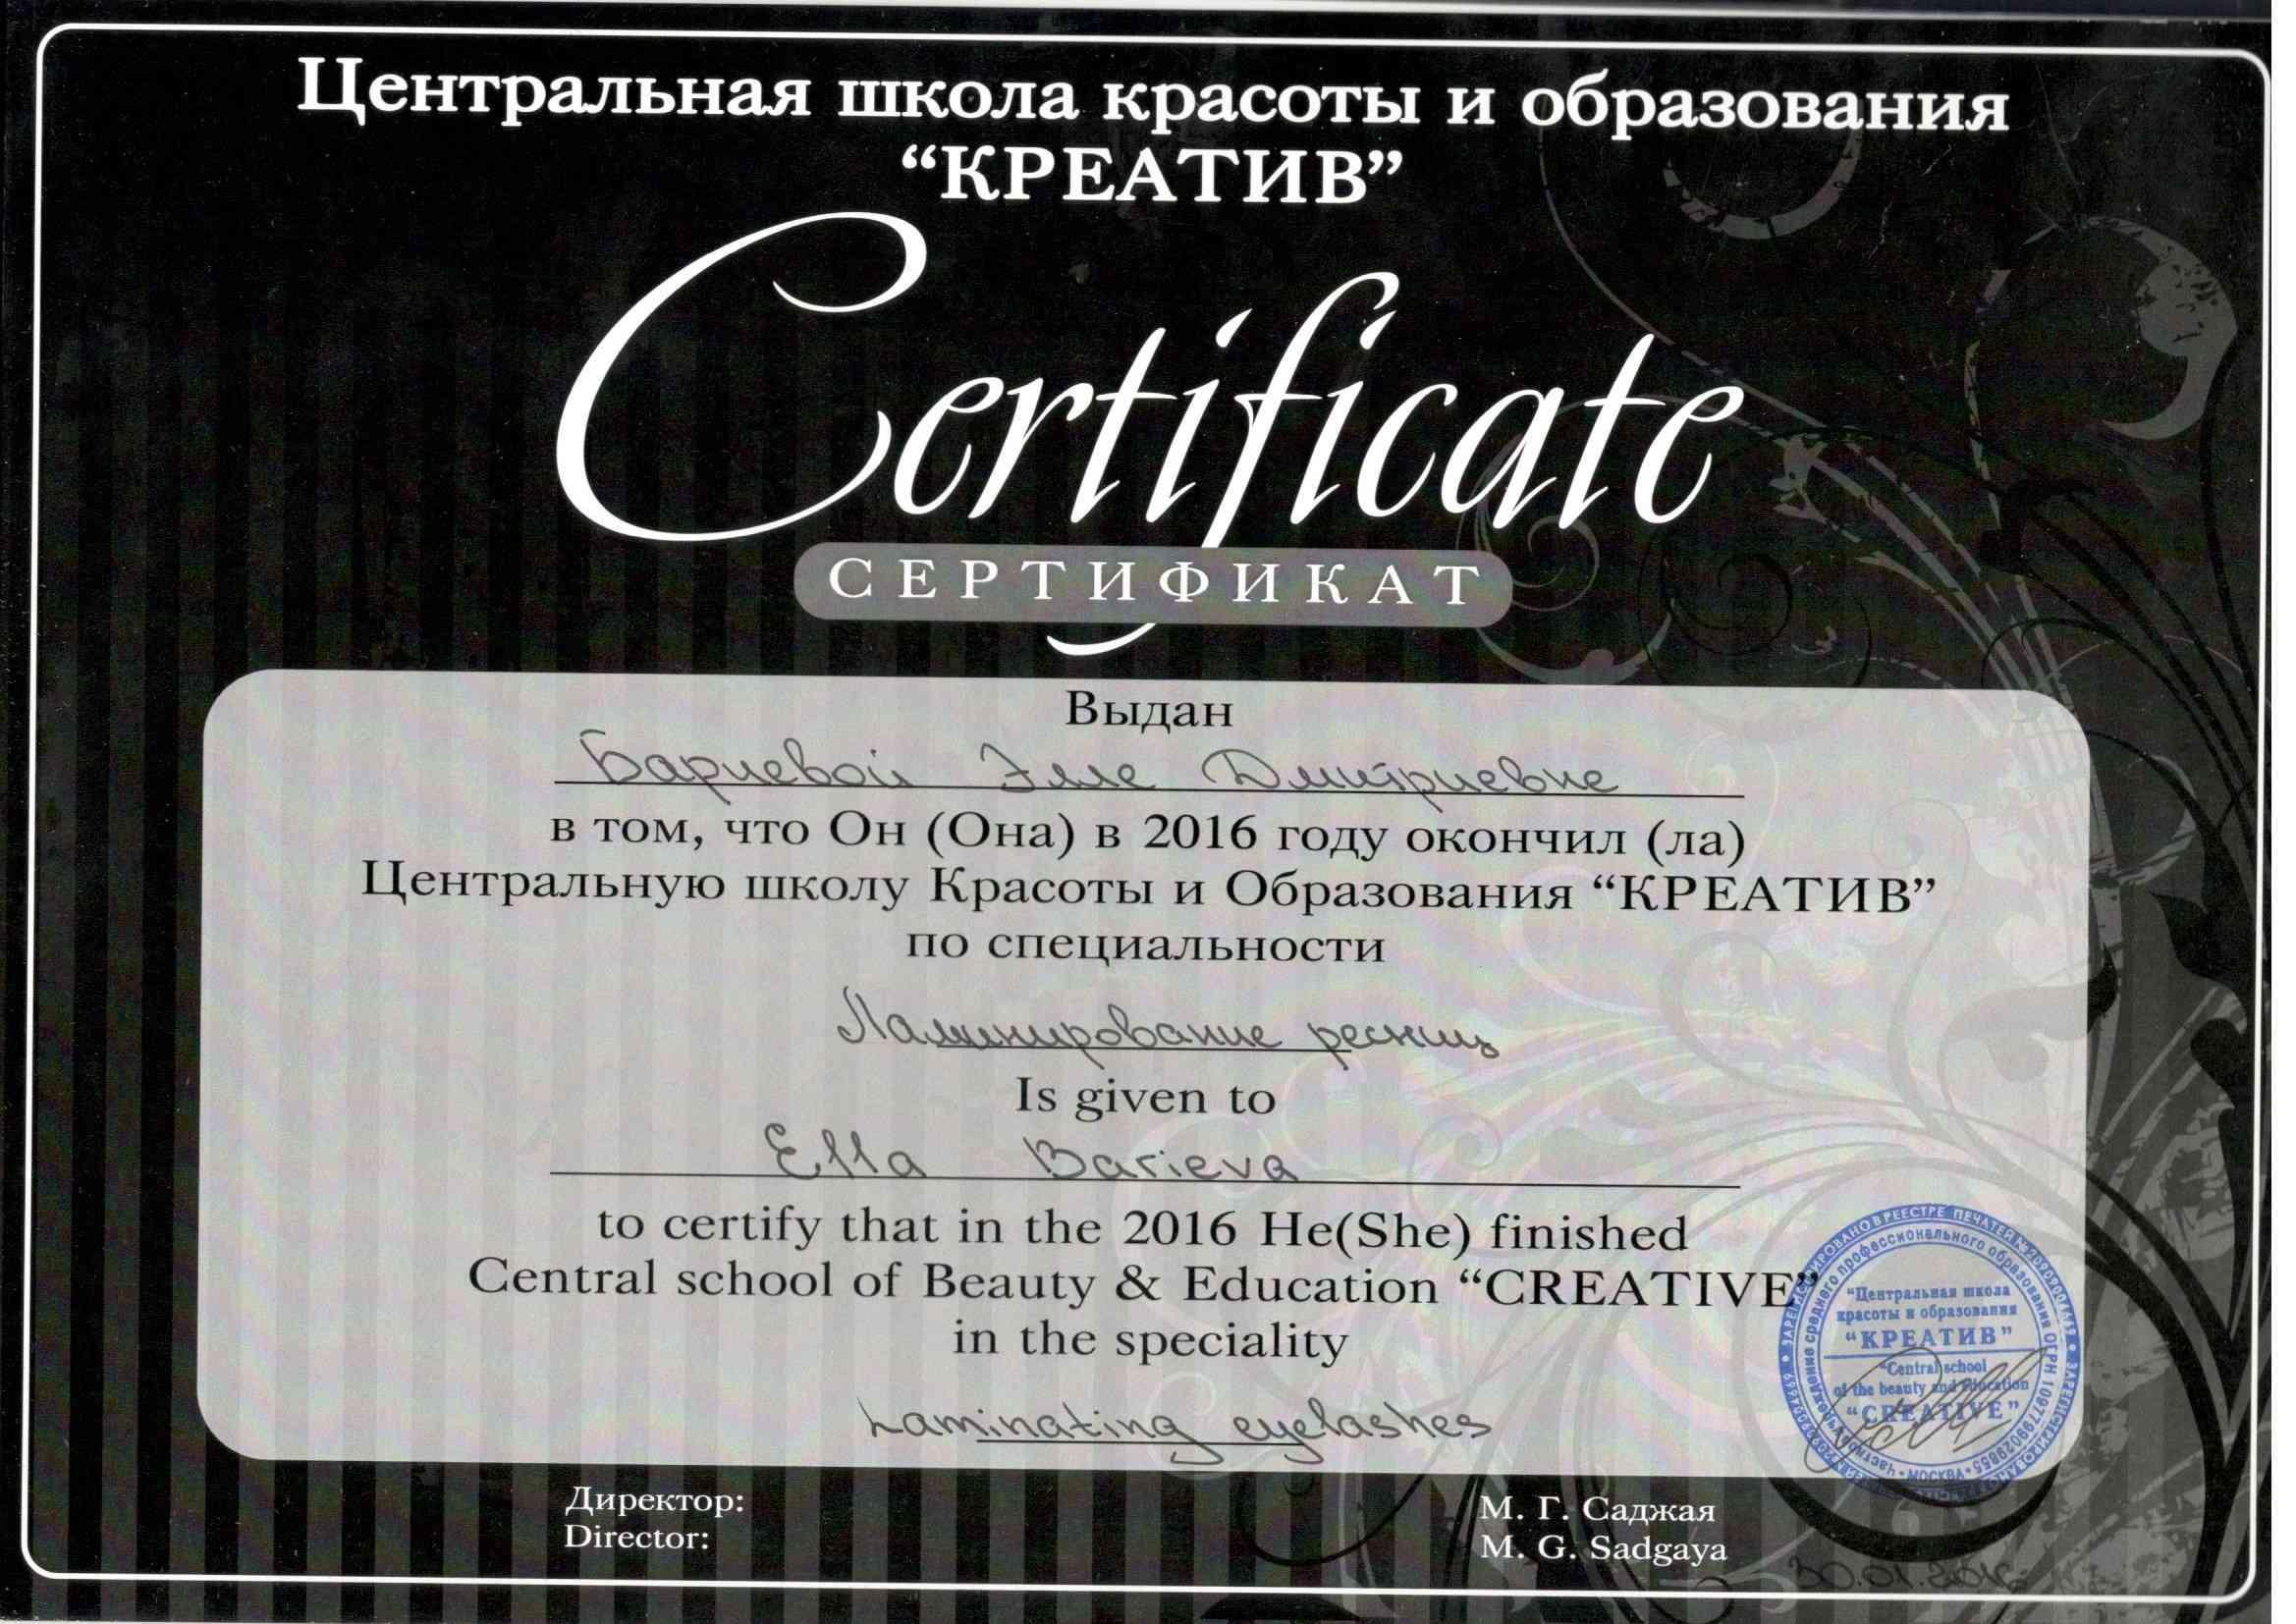 2016 Обучение по специализации Ламинирование ресниц